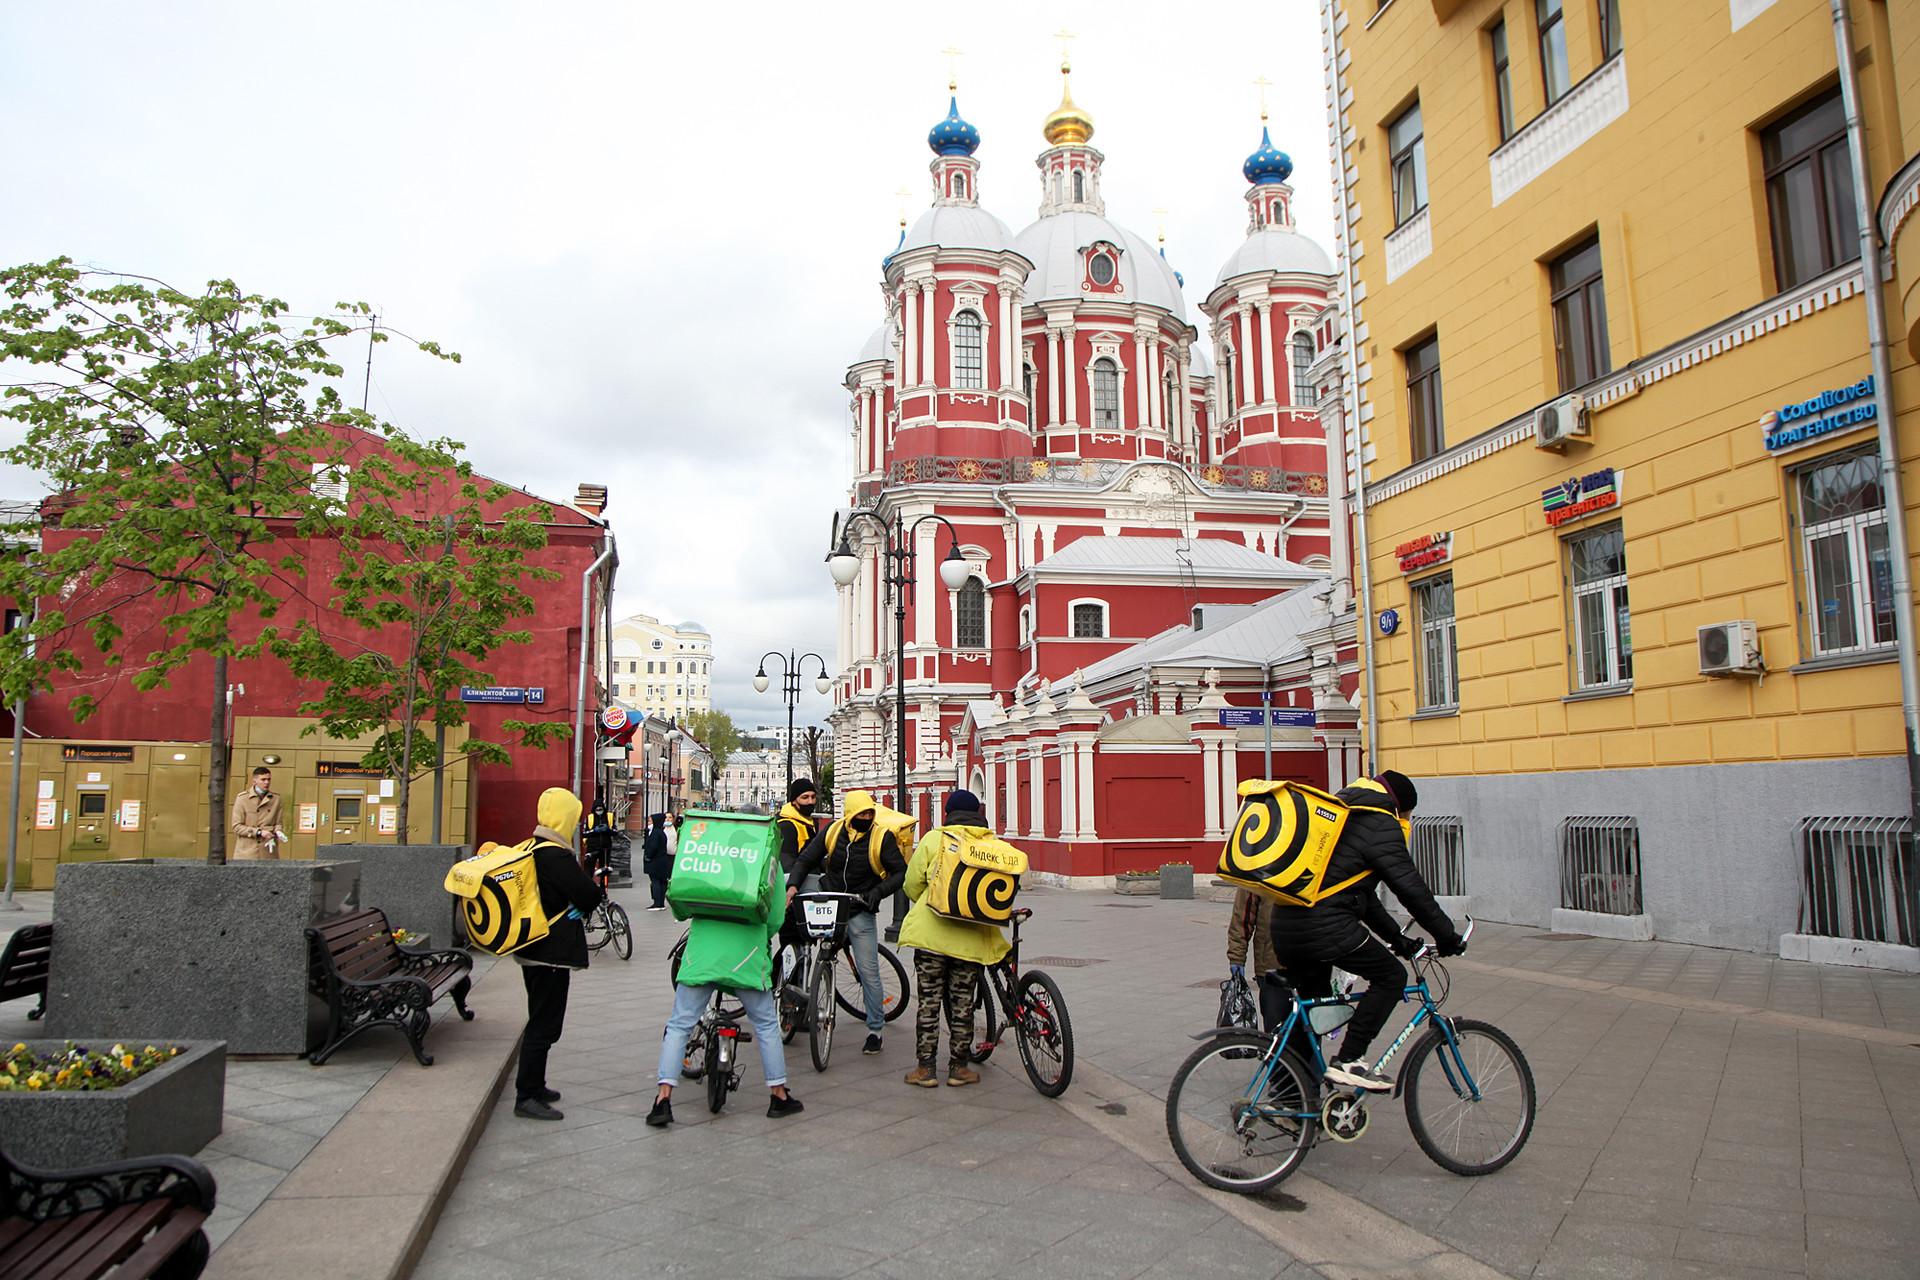 Sejumlah kurir makanan berkumpul tidak jauh dari Stasiun Metro Tretyakovskaya, tempat terdapat banyak restoran cepat saji yang hanya melayani pengiriman atau menerima pesanan.